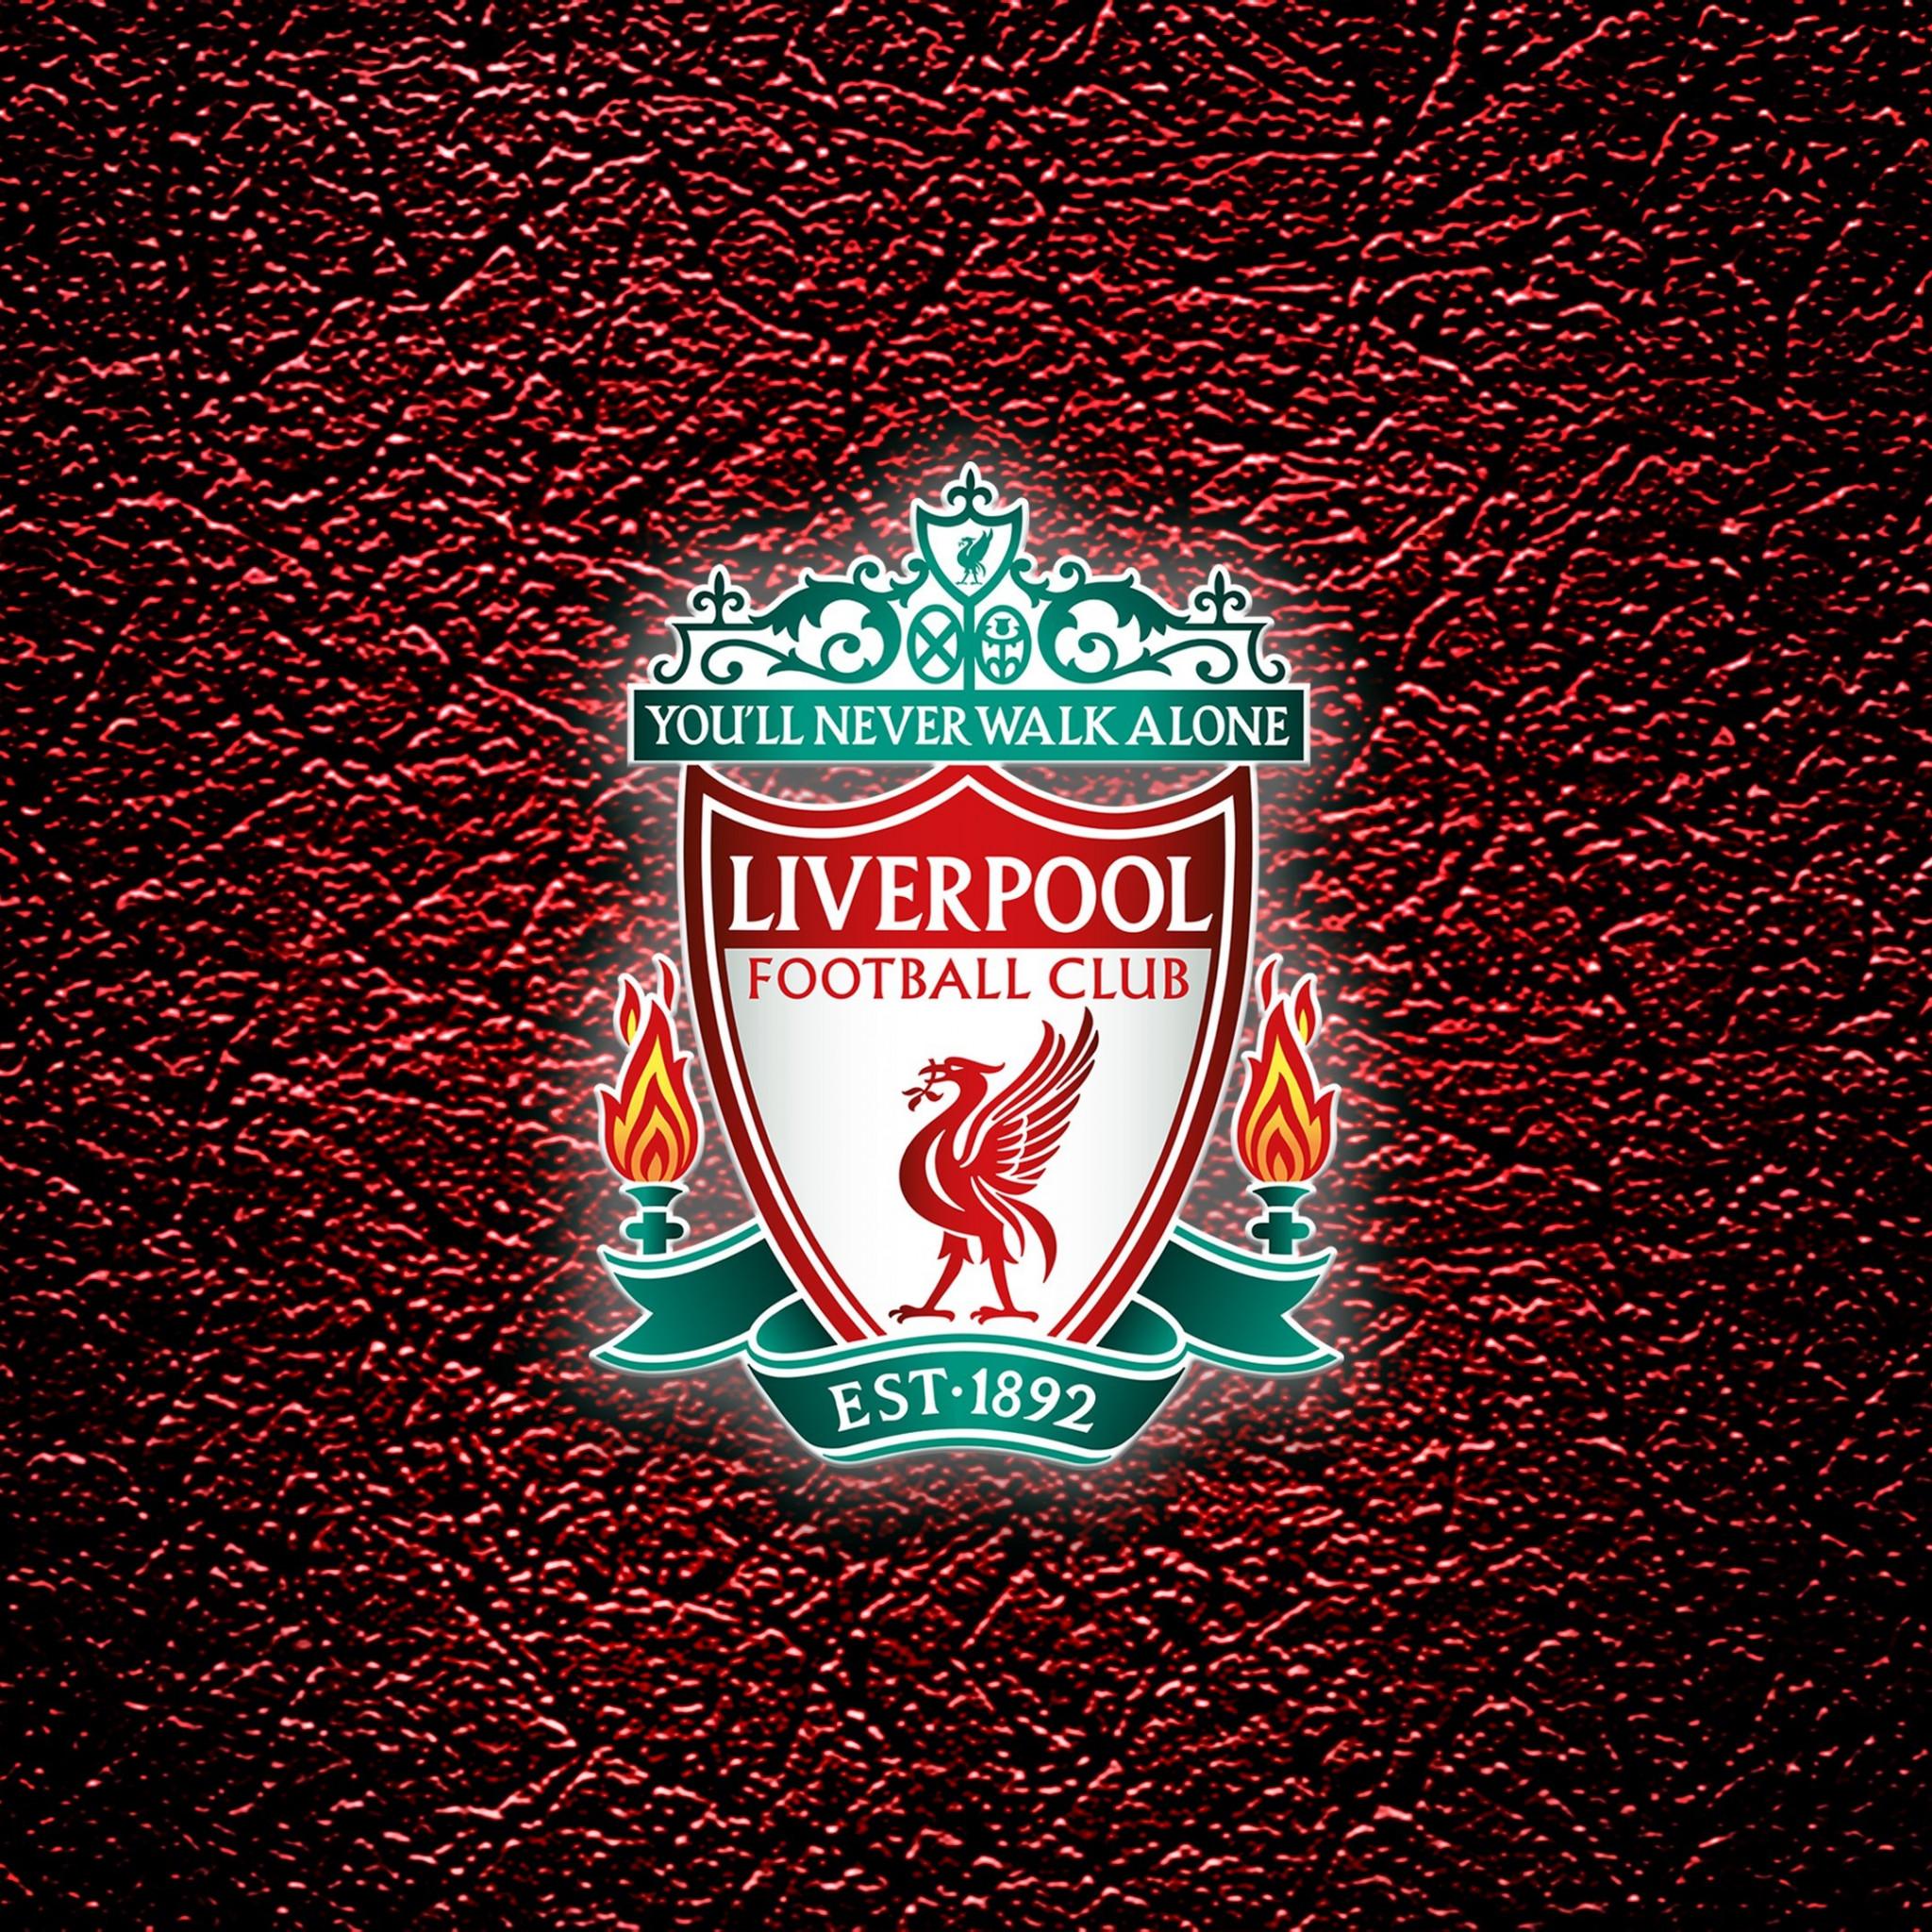 Download Wallpaper Liverpool You Ll Never Walk Alone 2048x2048